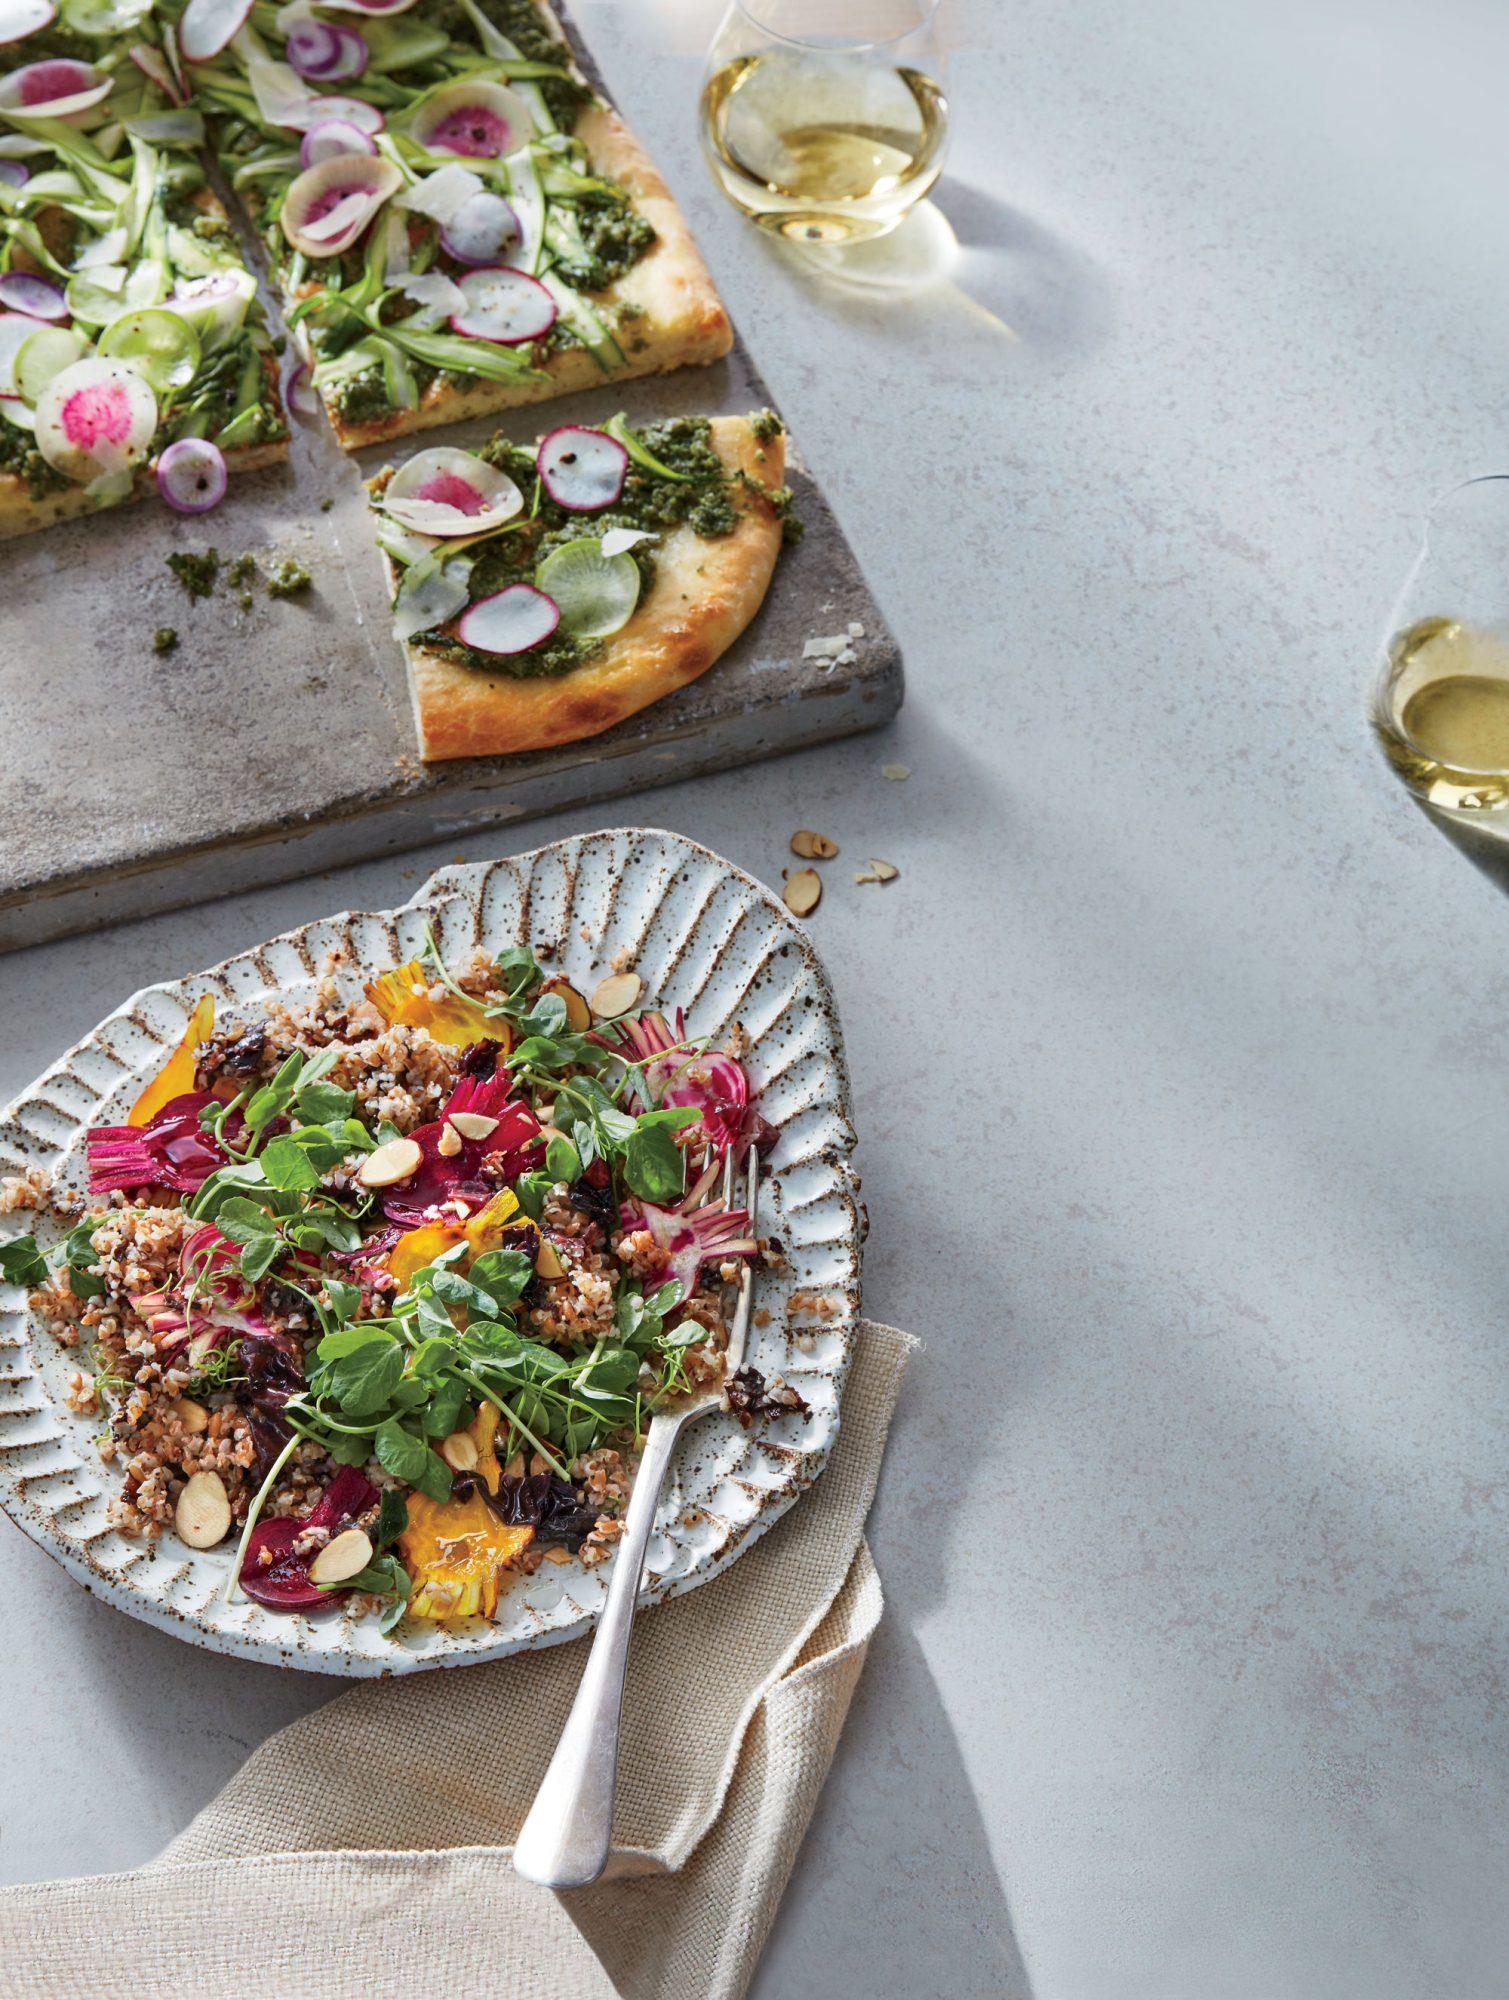 Flatbread with Kelp-Walnut Pesto and Asparagus